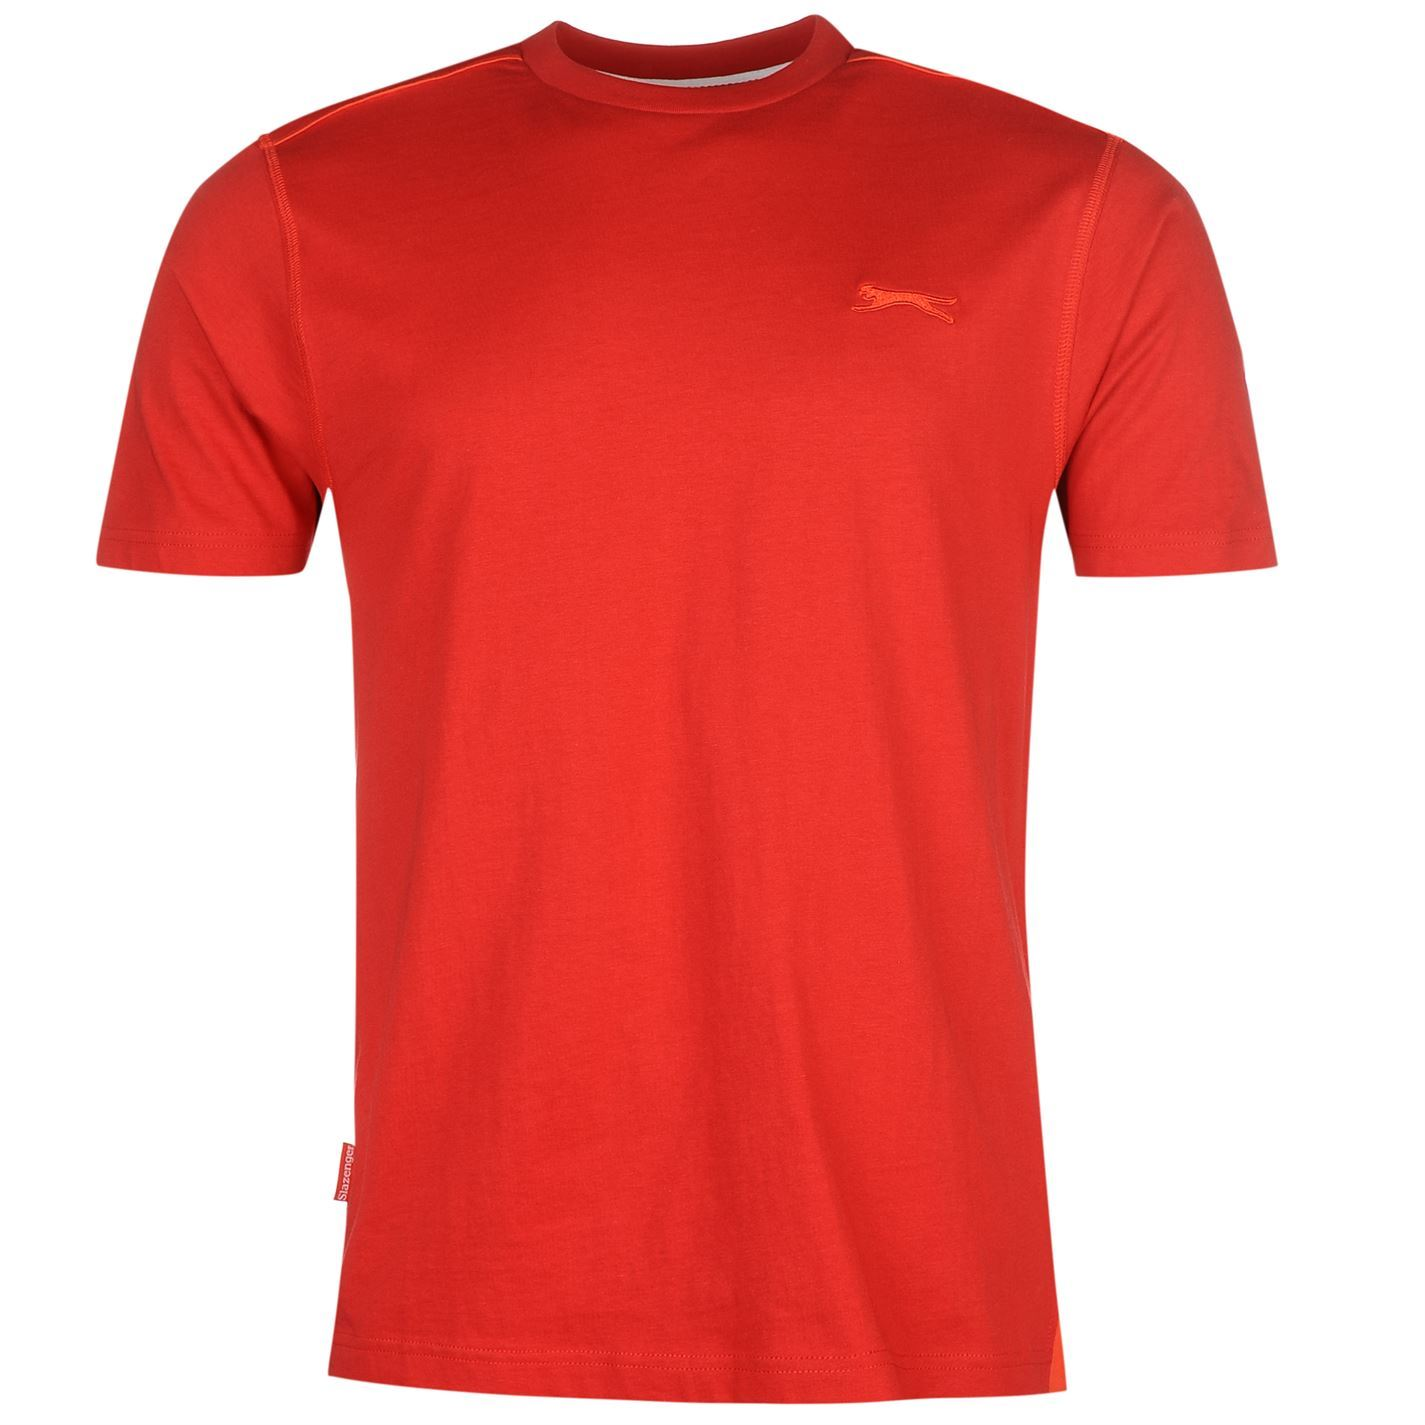 f9bbe1b44f ... Slazenger Plain T-Shirt Mens Red Sportswear Top Tee Shirt ...